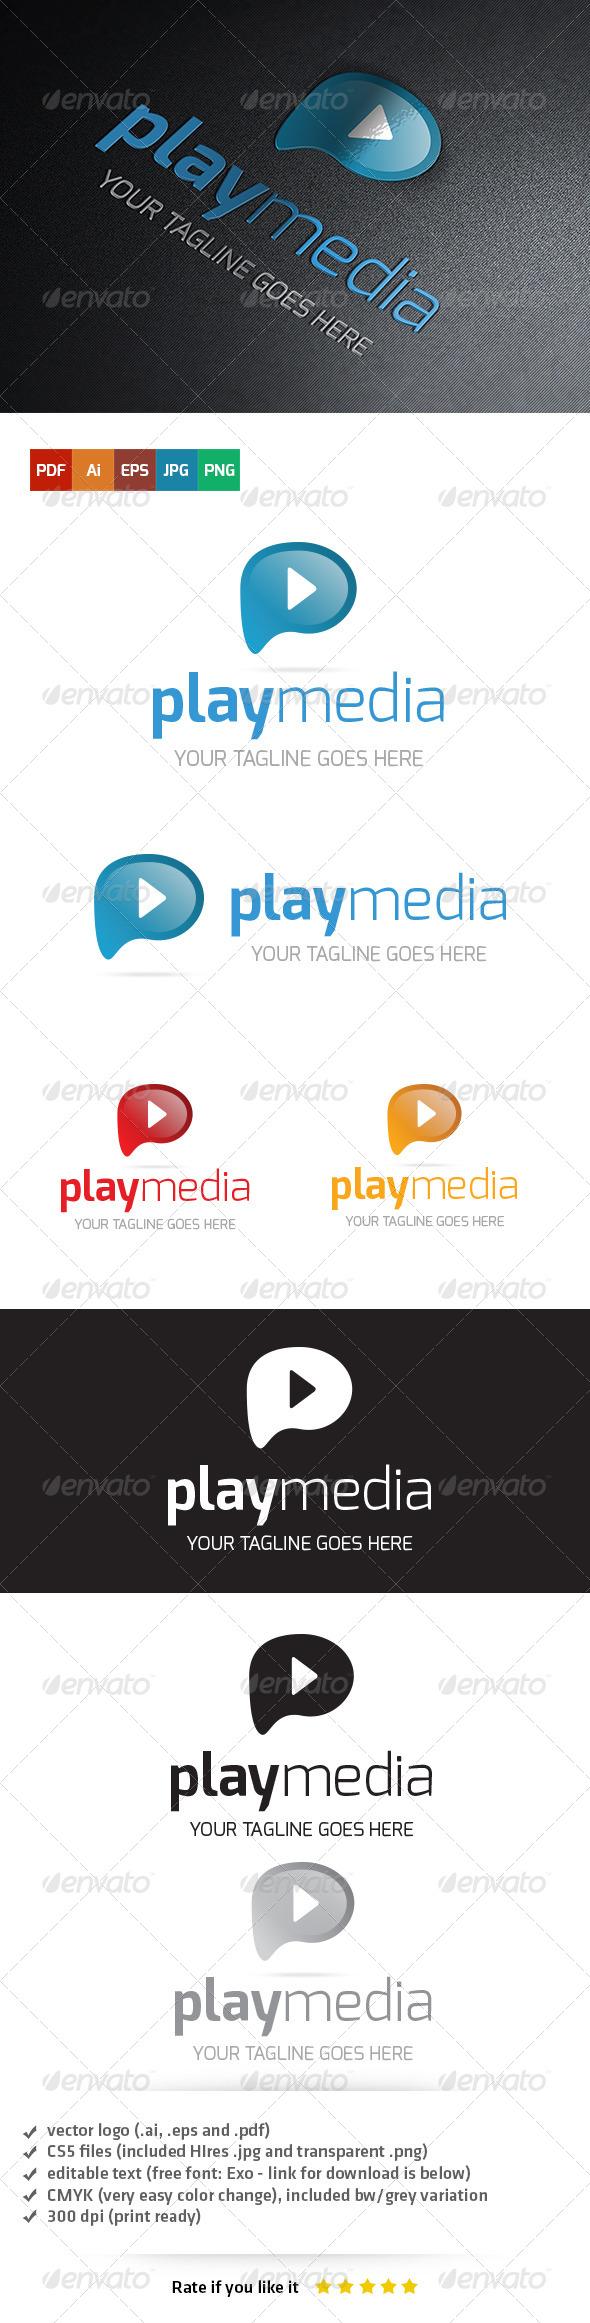 Play Media Logo Template - Vector Abstract